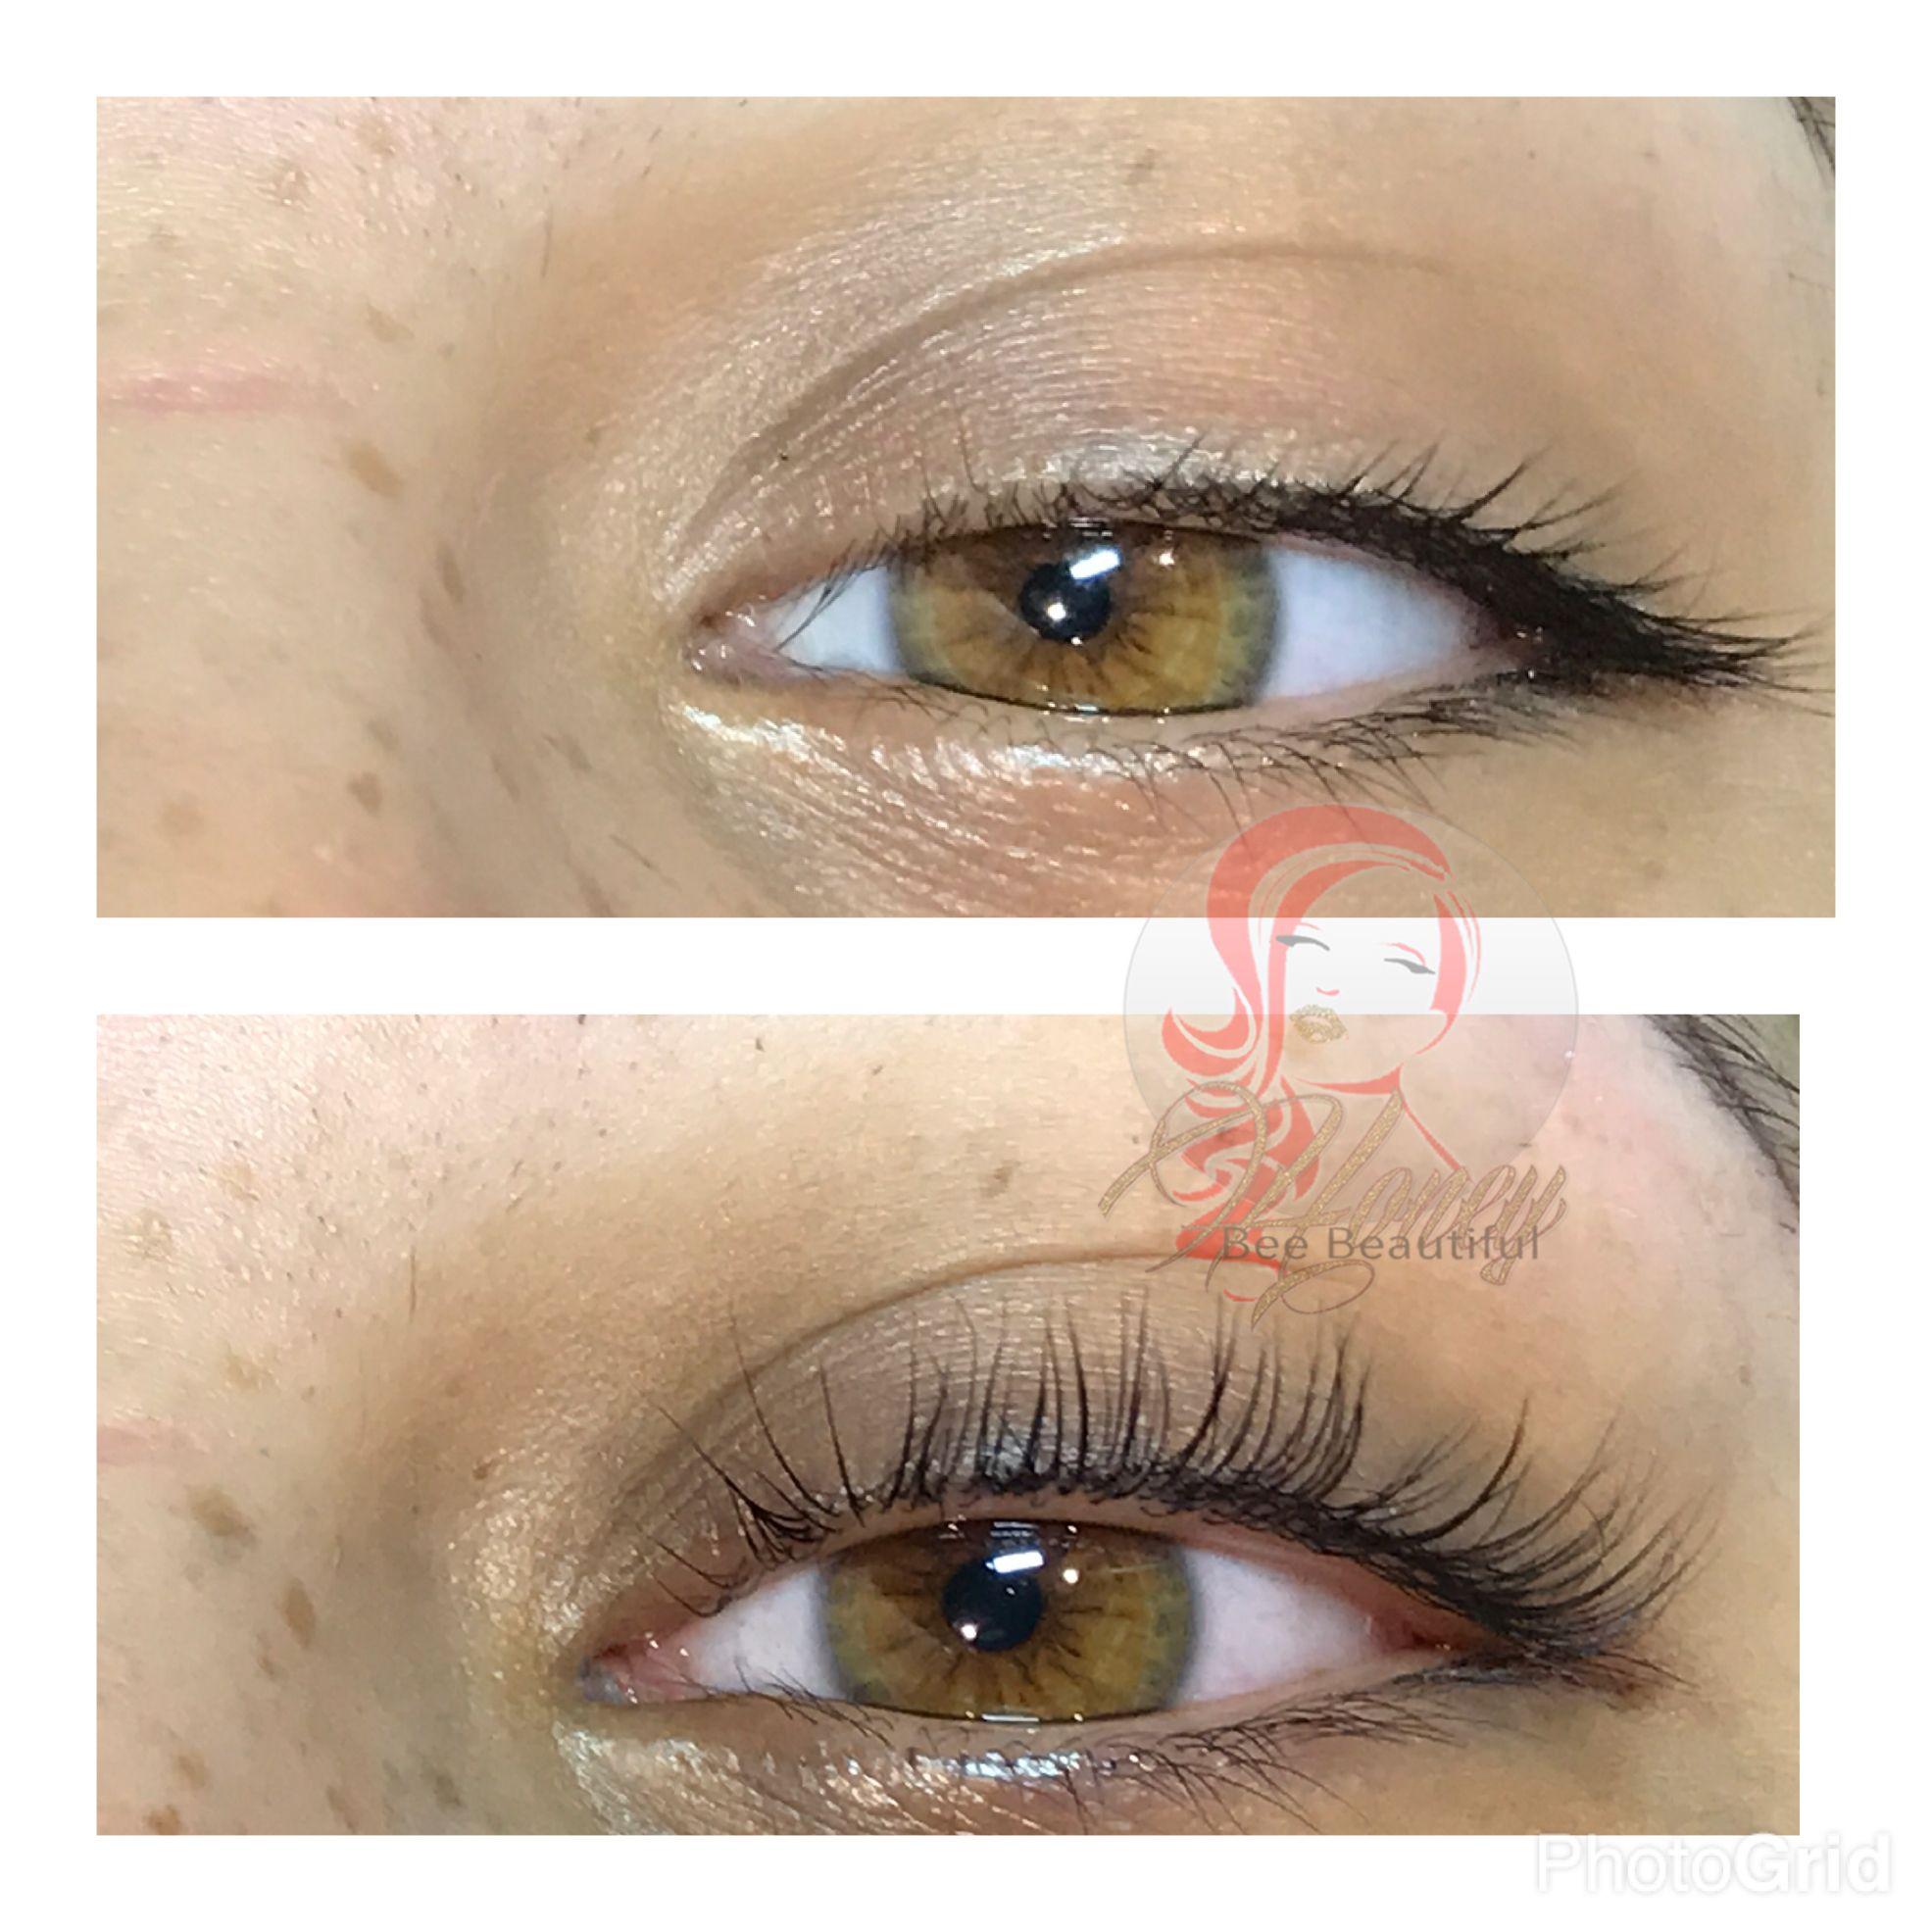 ce721385562 What's a Keratin Lash Lift? | Honey, Bee Beautiful | Makeup ...